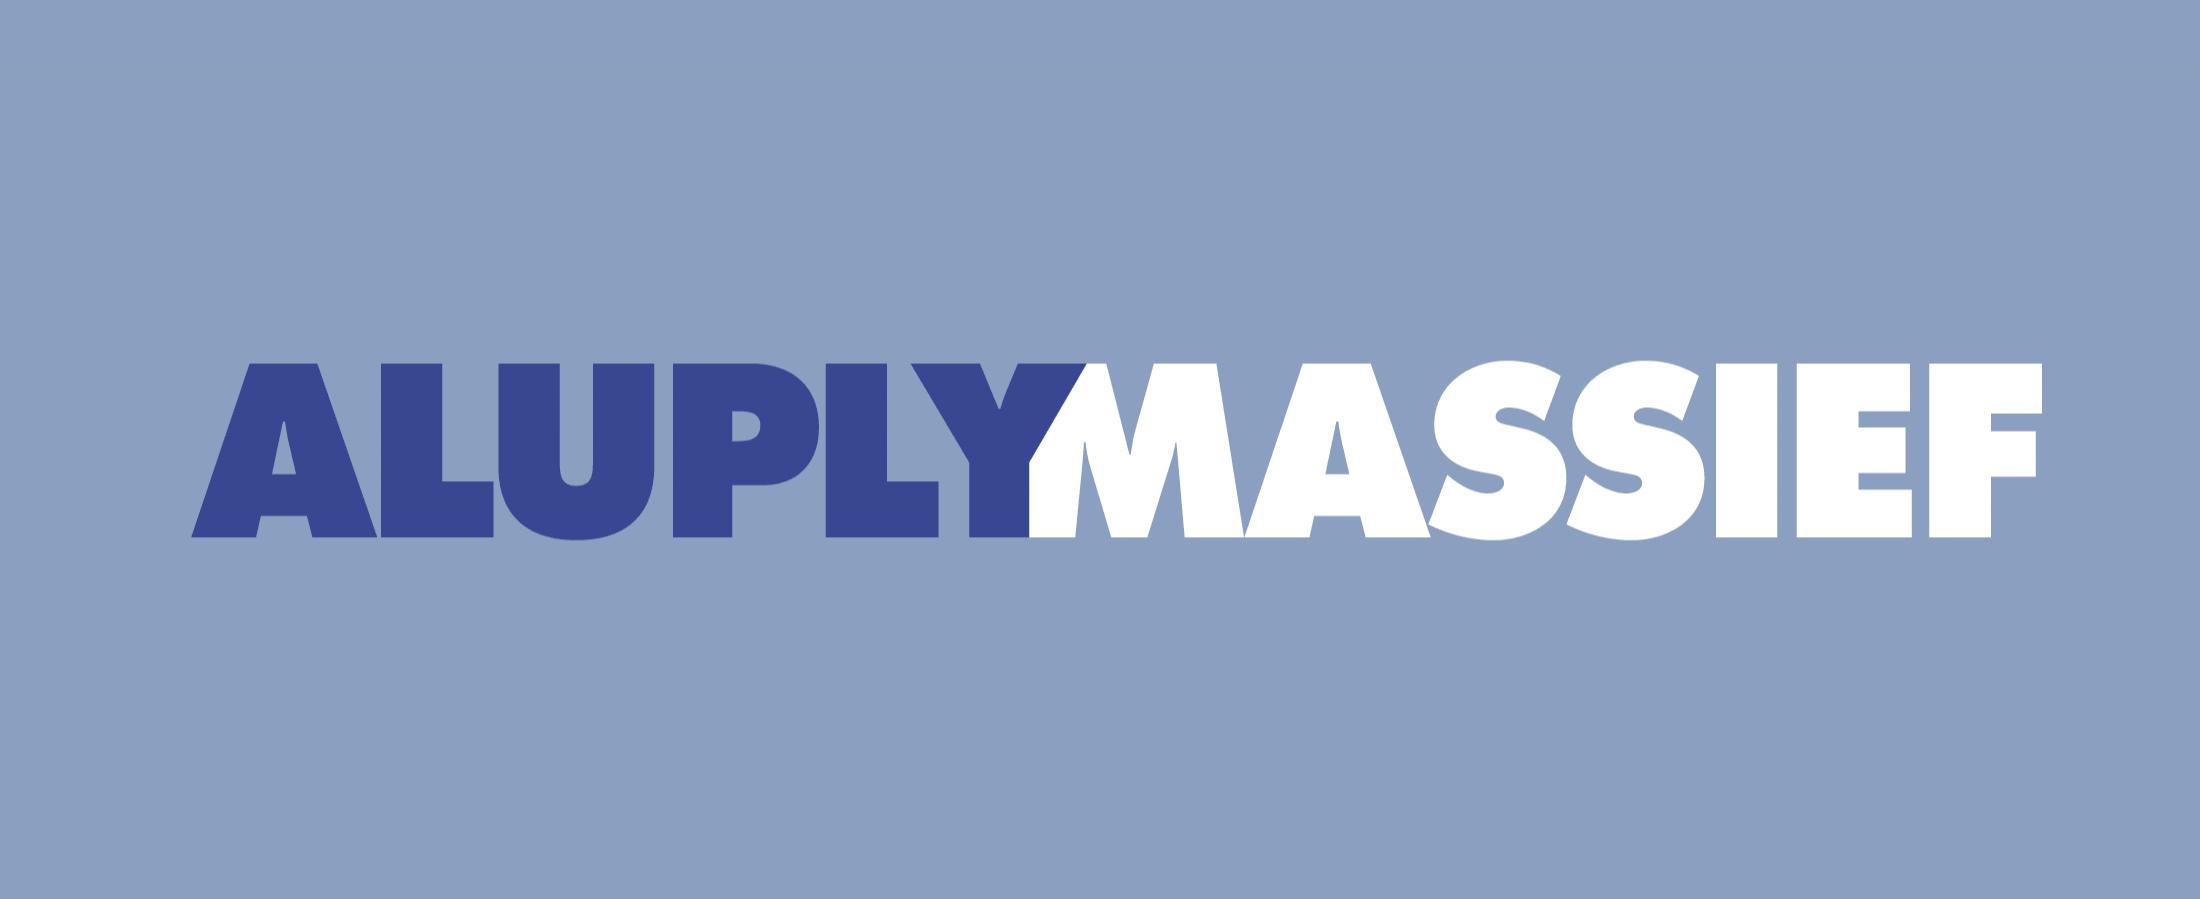 logo-aluply-massief-huistopper-witzand-bouwmaterialen